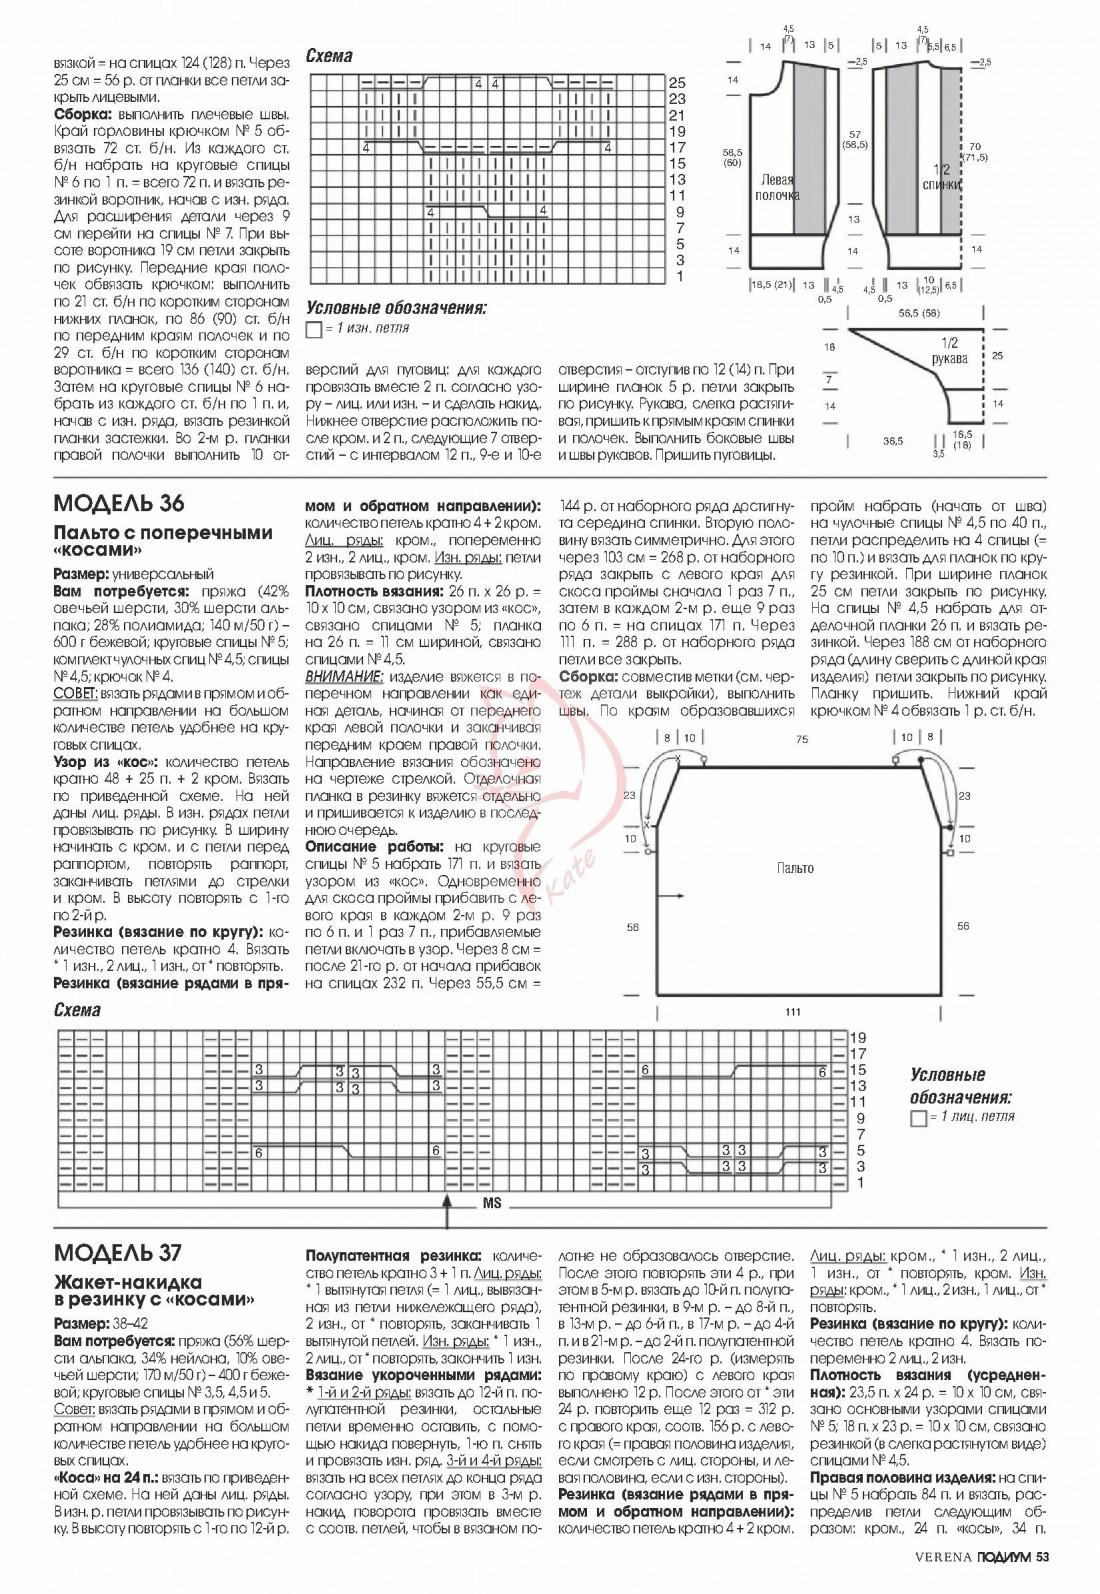 Page_00053dff7b8f20861b1e6.jpg